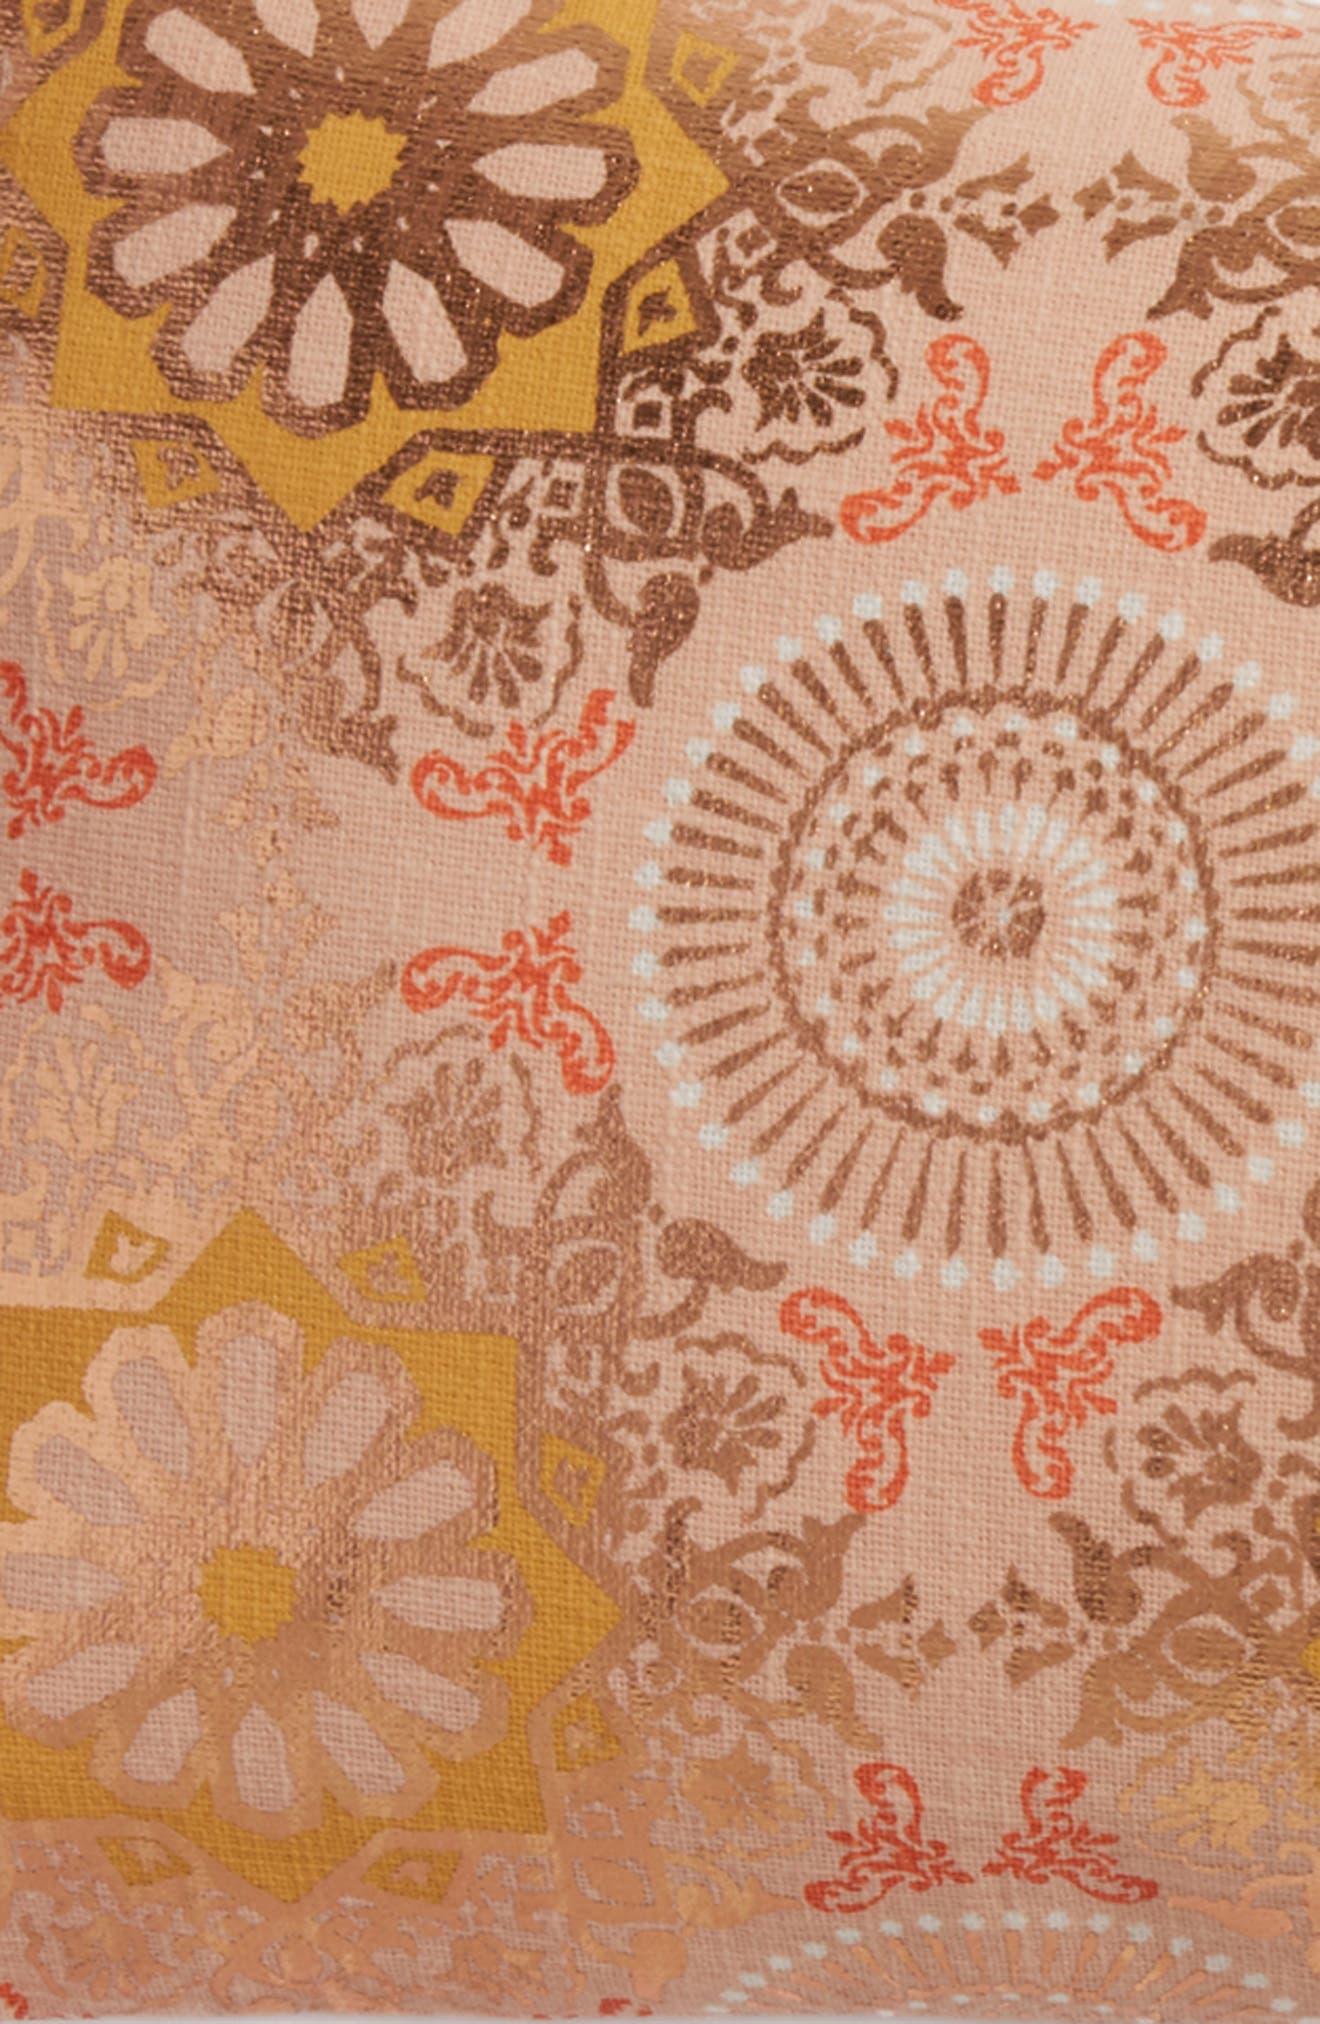 Moroccan Print Accent Pillow,                             Alternate thumbnail 3, color,                             650